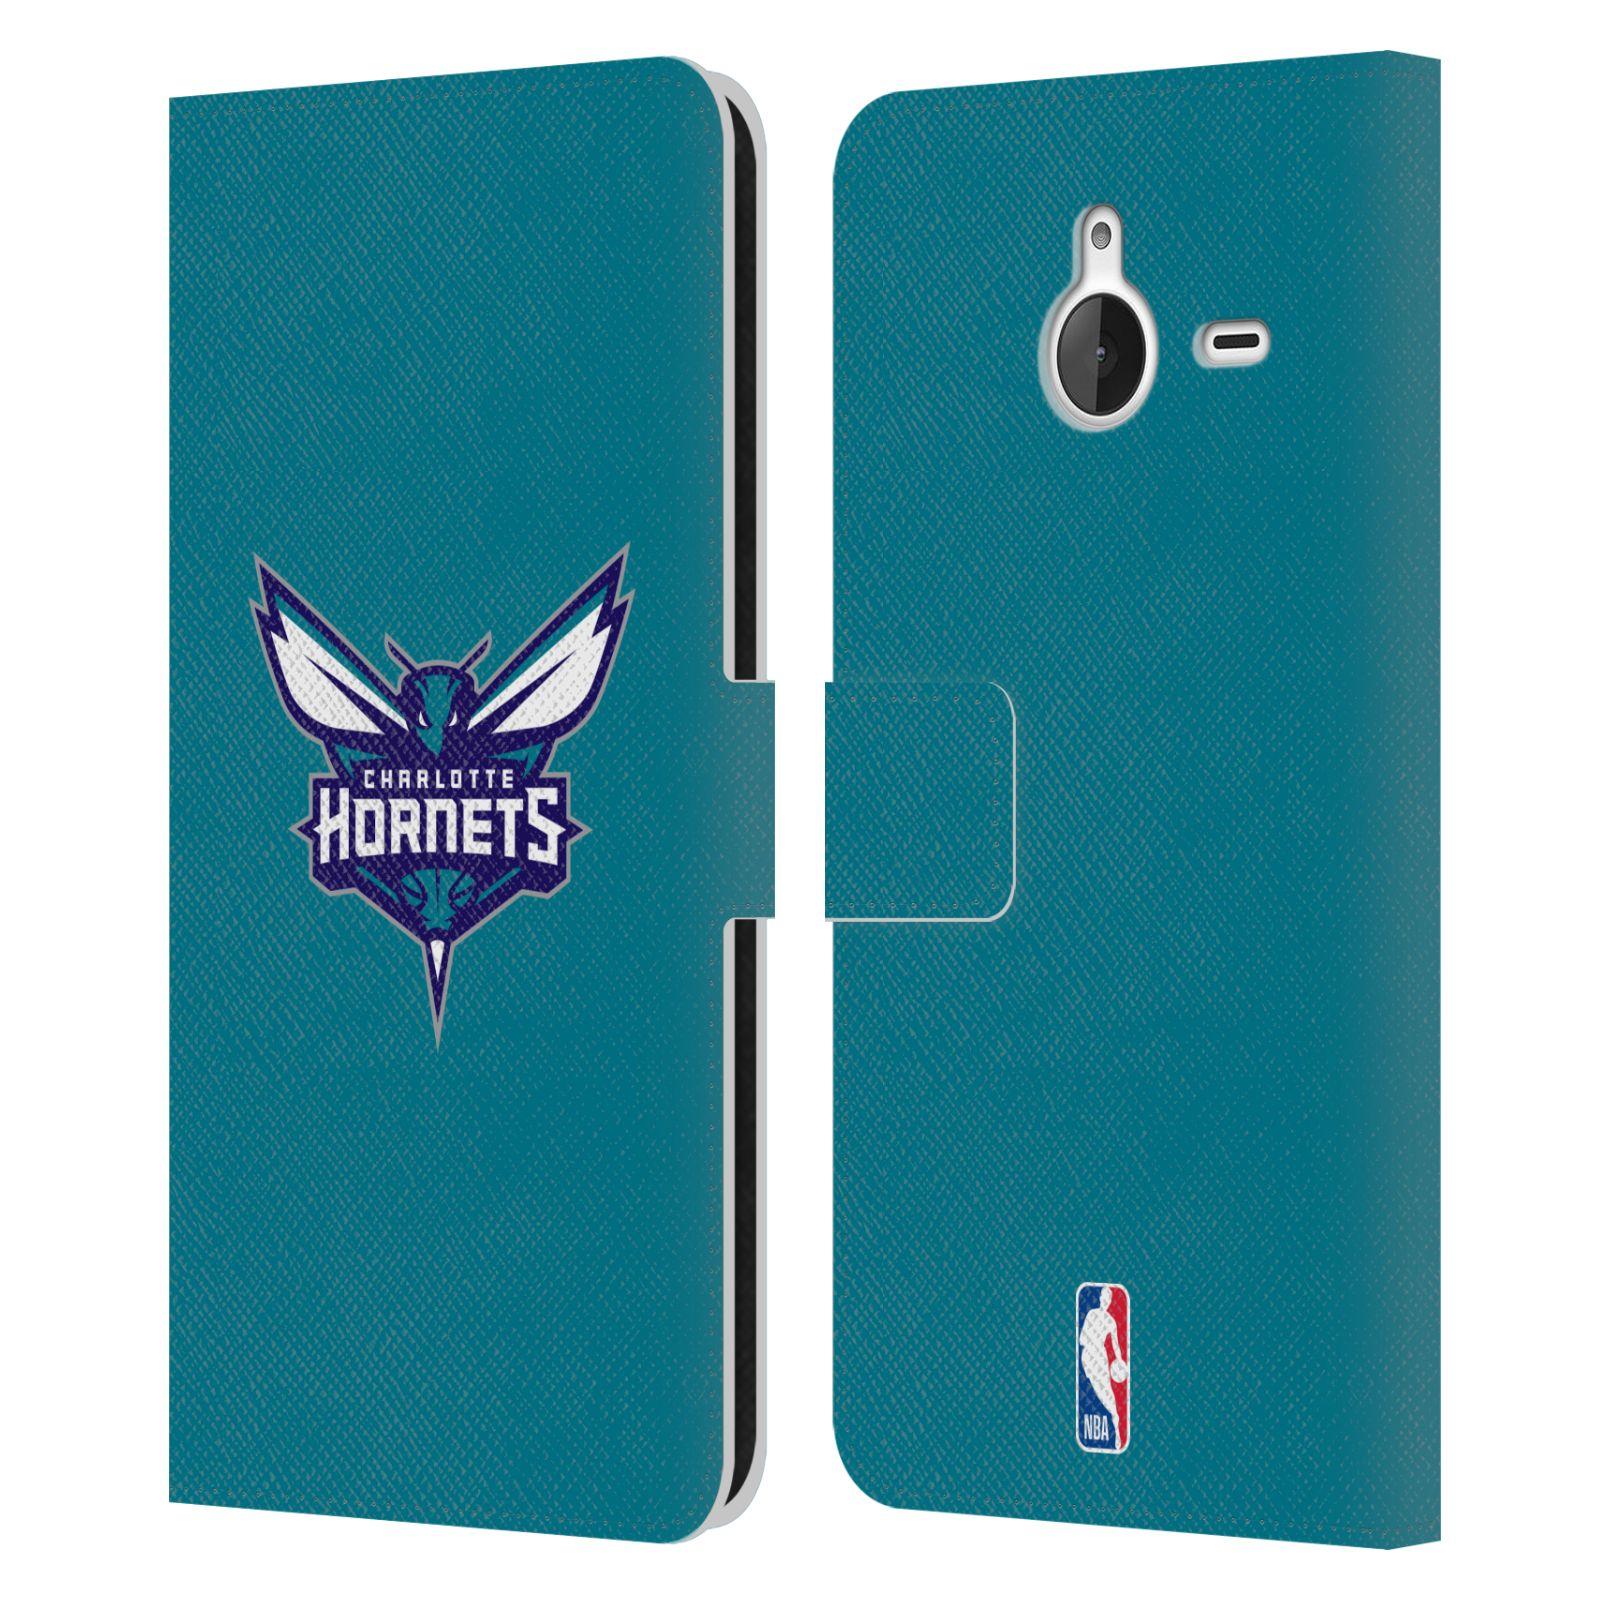 Pouzdro na mobil Nokia Lumia 640 XL - Head Case -NBA - Charlotte Hornets modrá barva znak